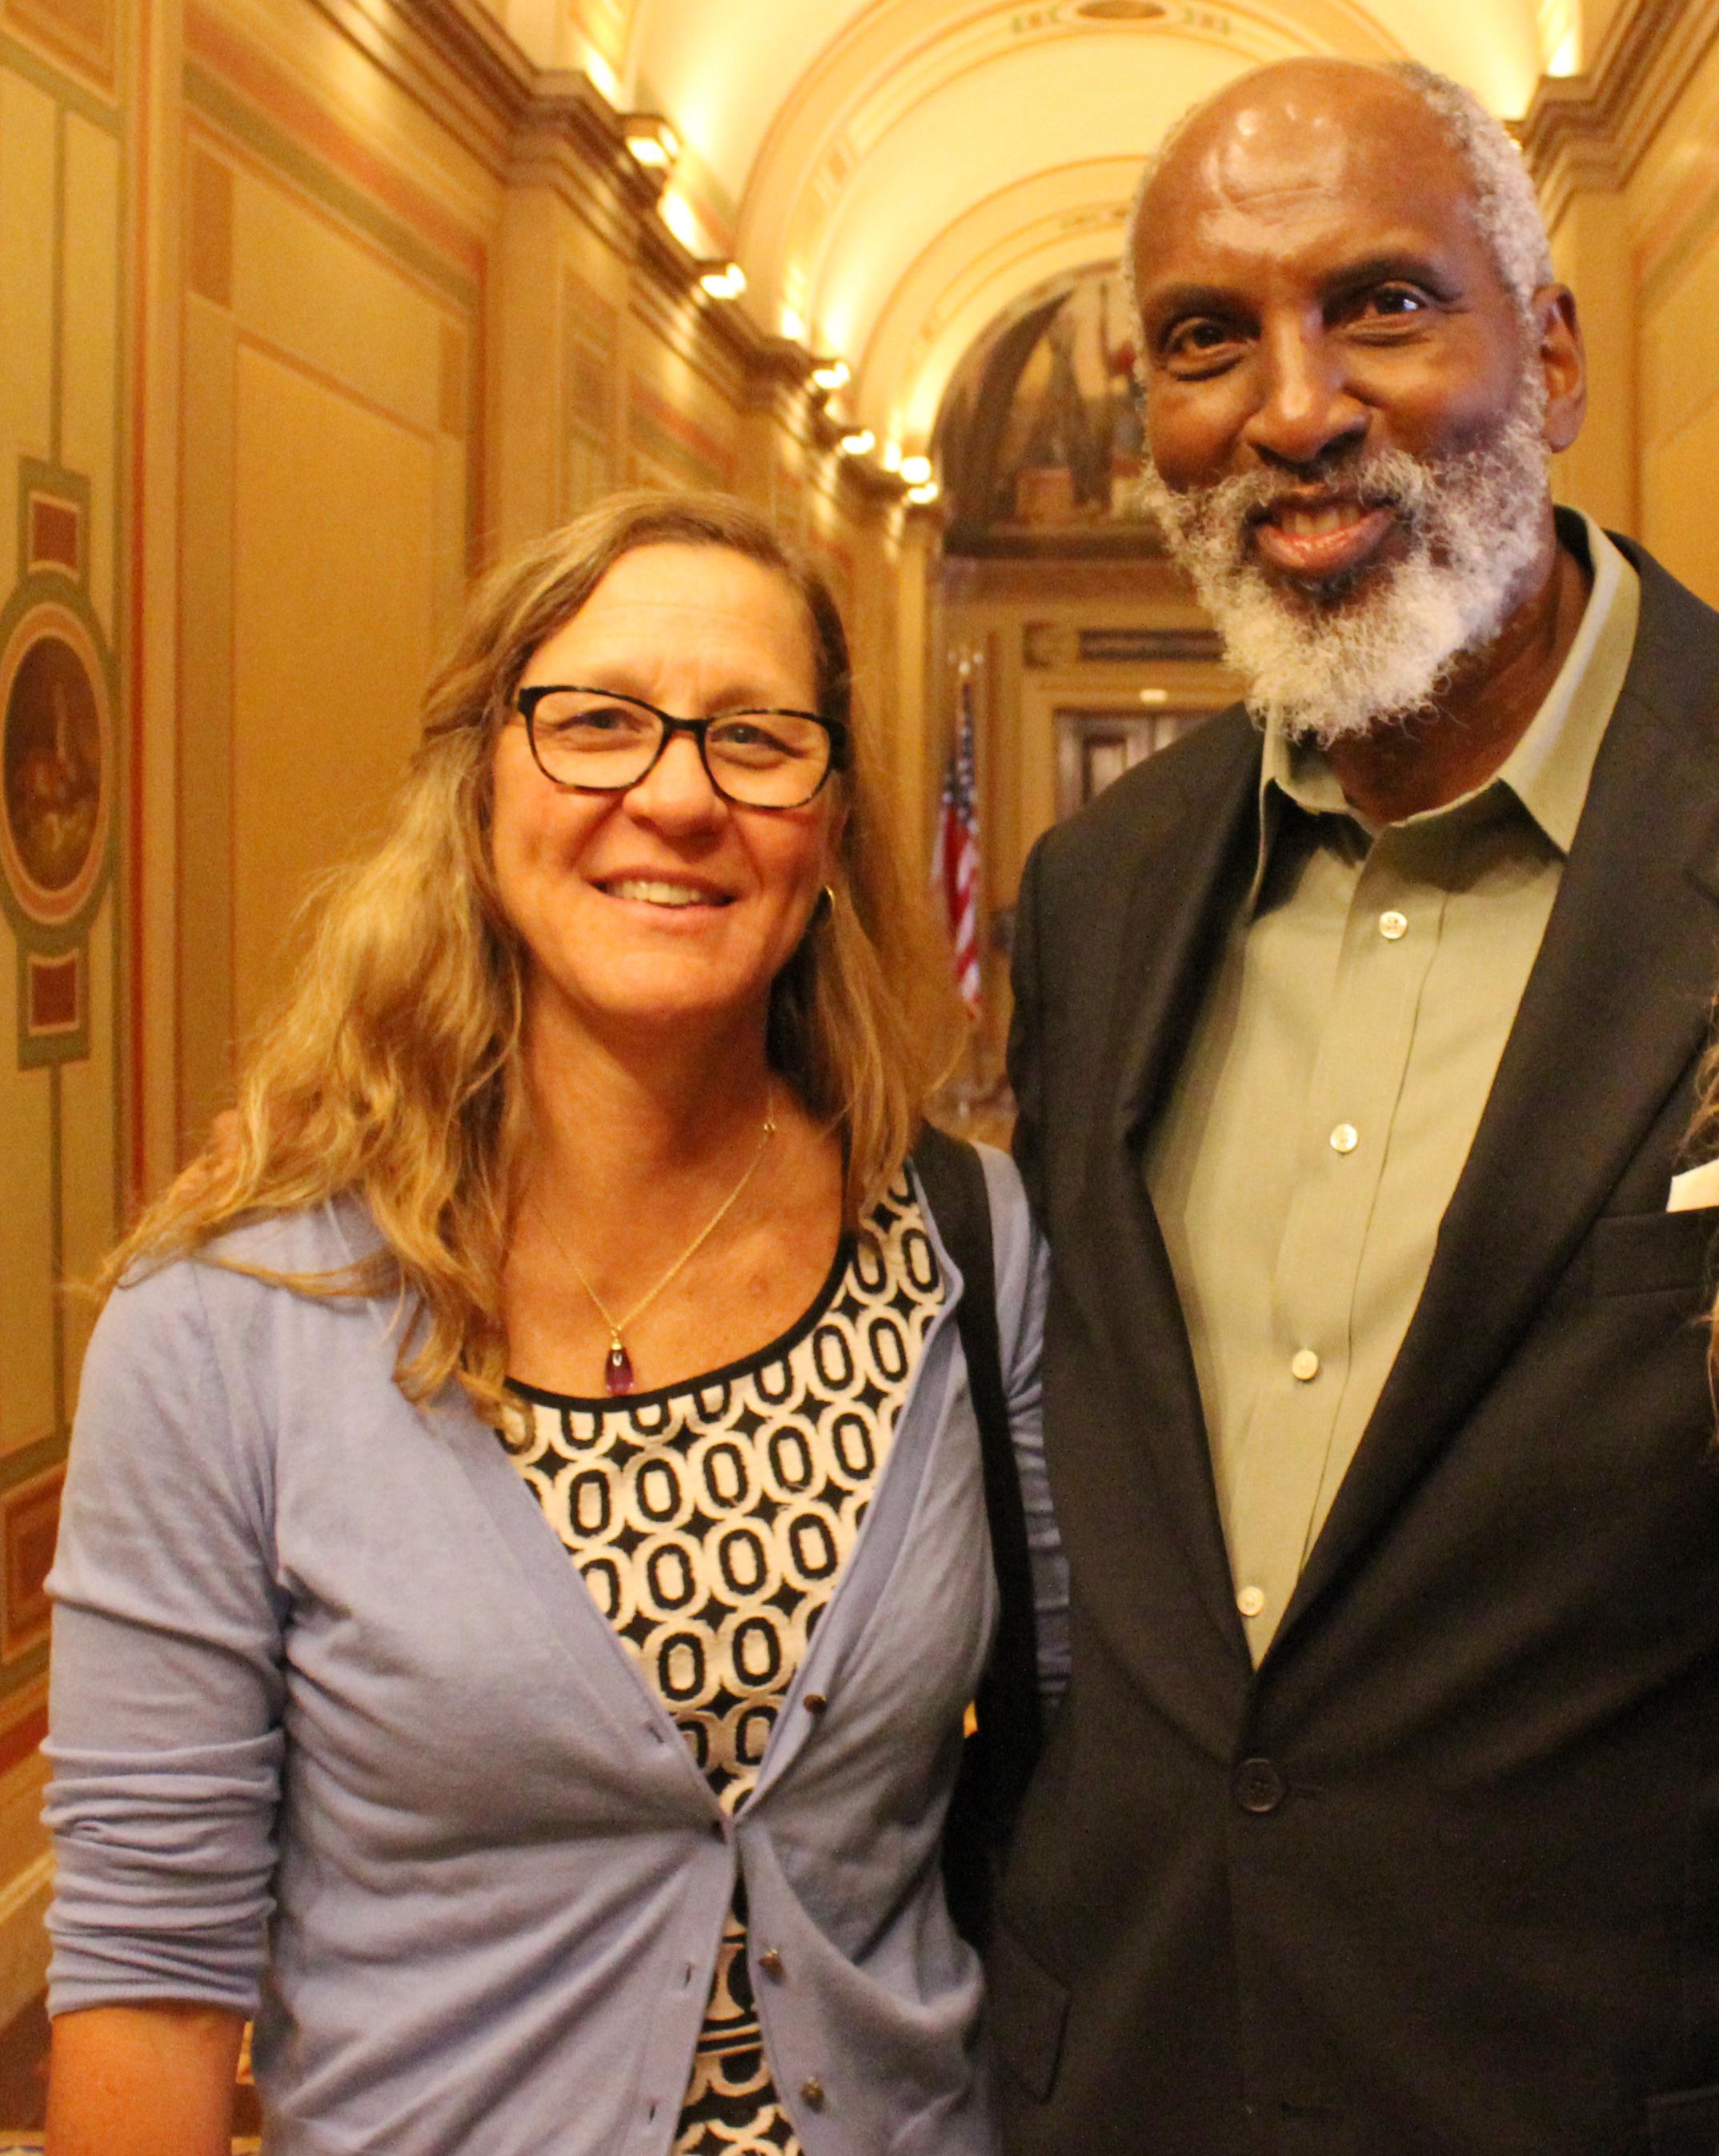 Hilary Hoynes and john powell at Capitol Hill